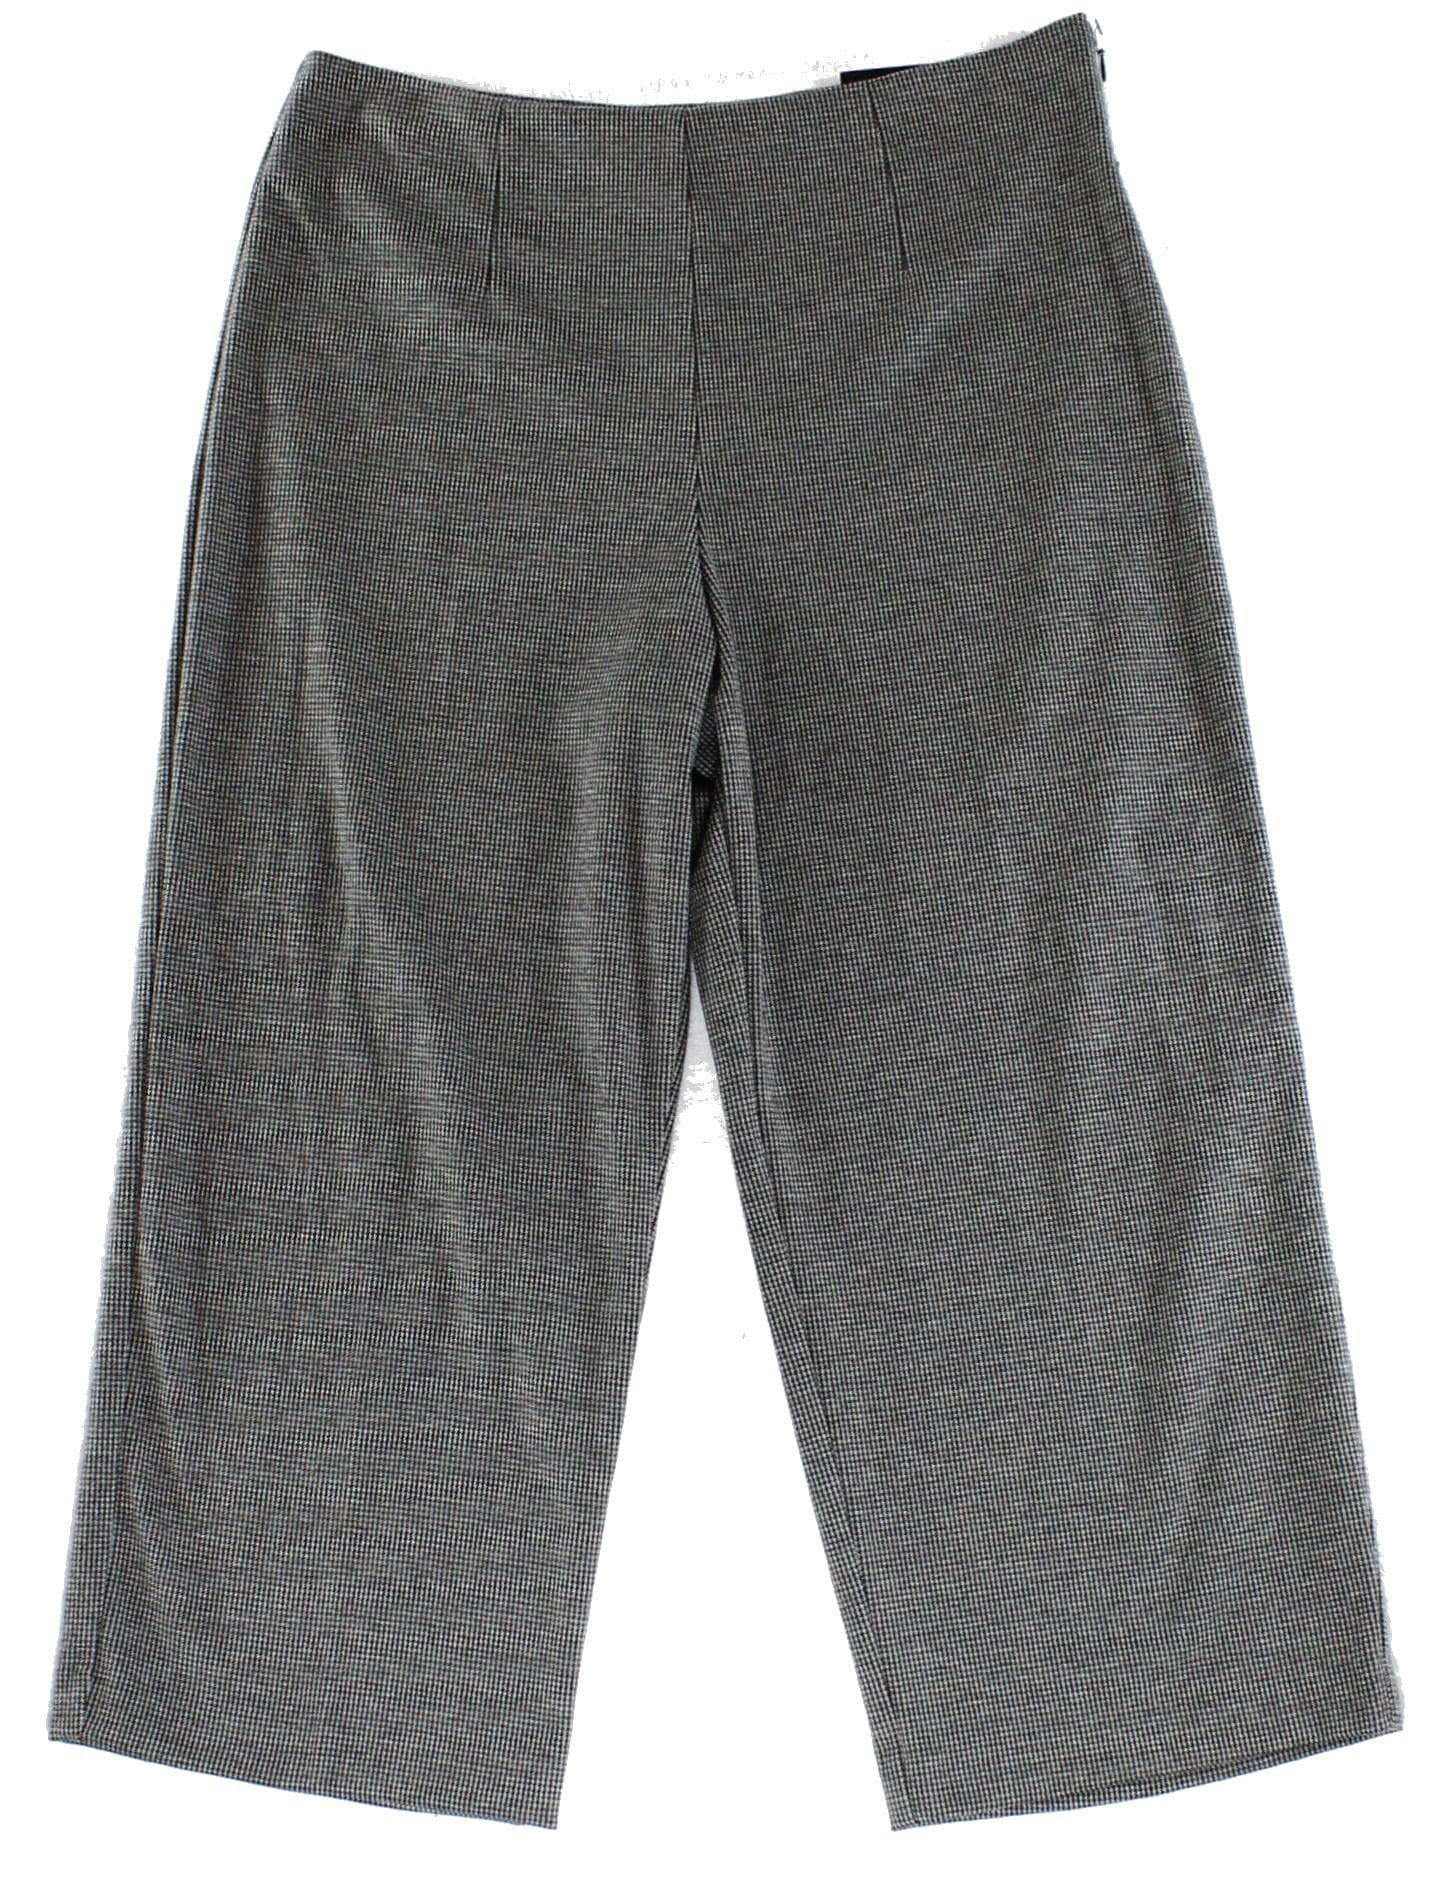 Alfani NEW Gray Womens Size 16 Flat Front Capri Cropped Dress Pants